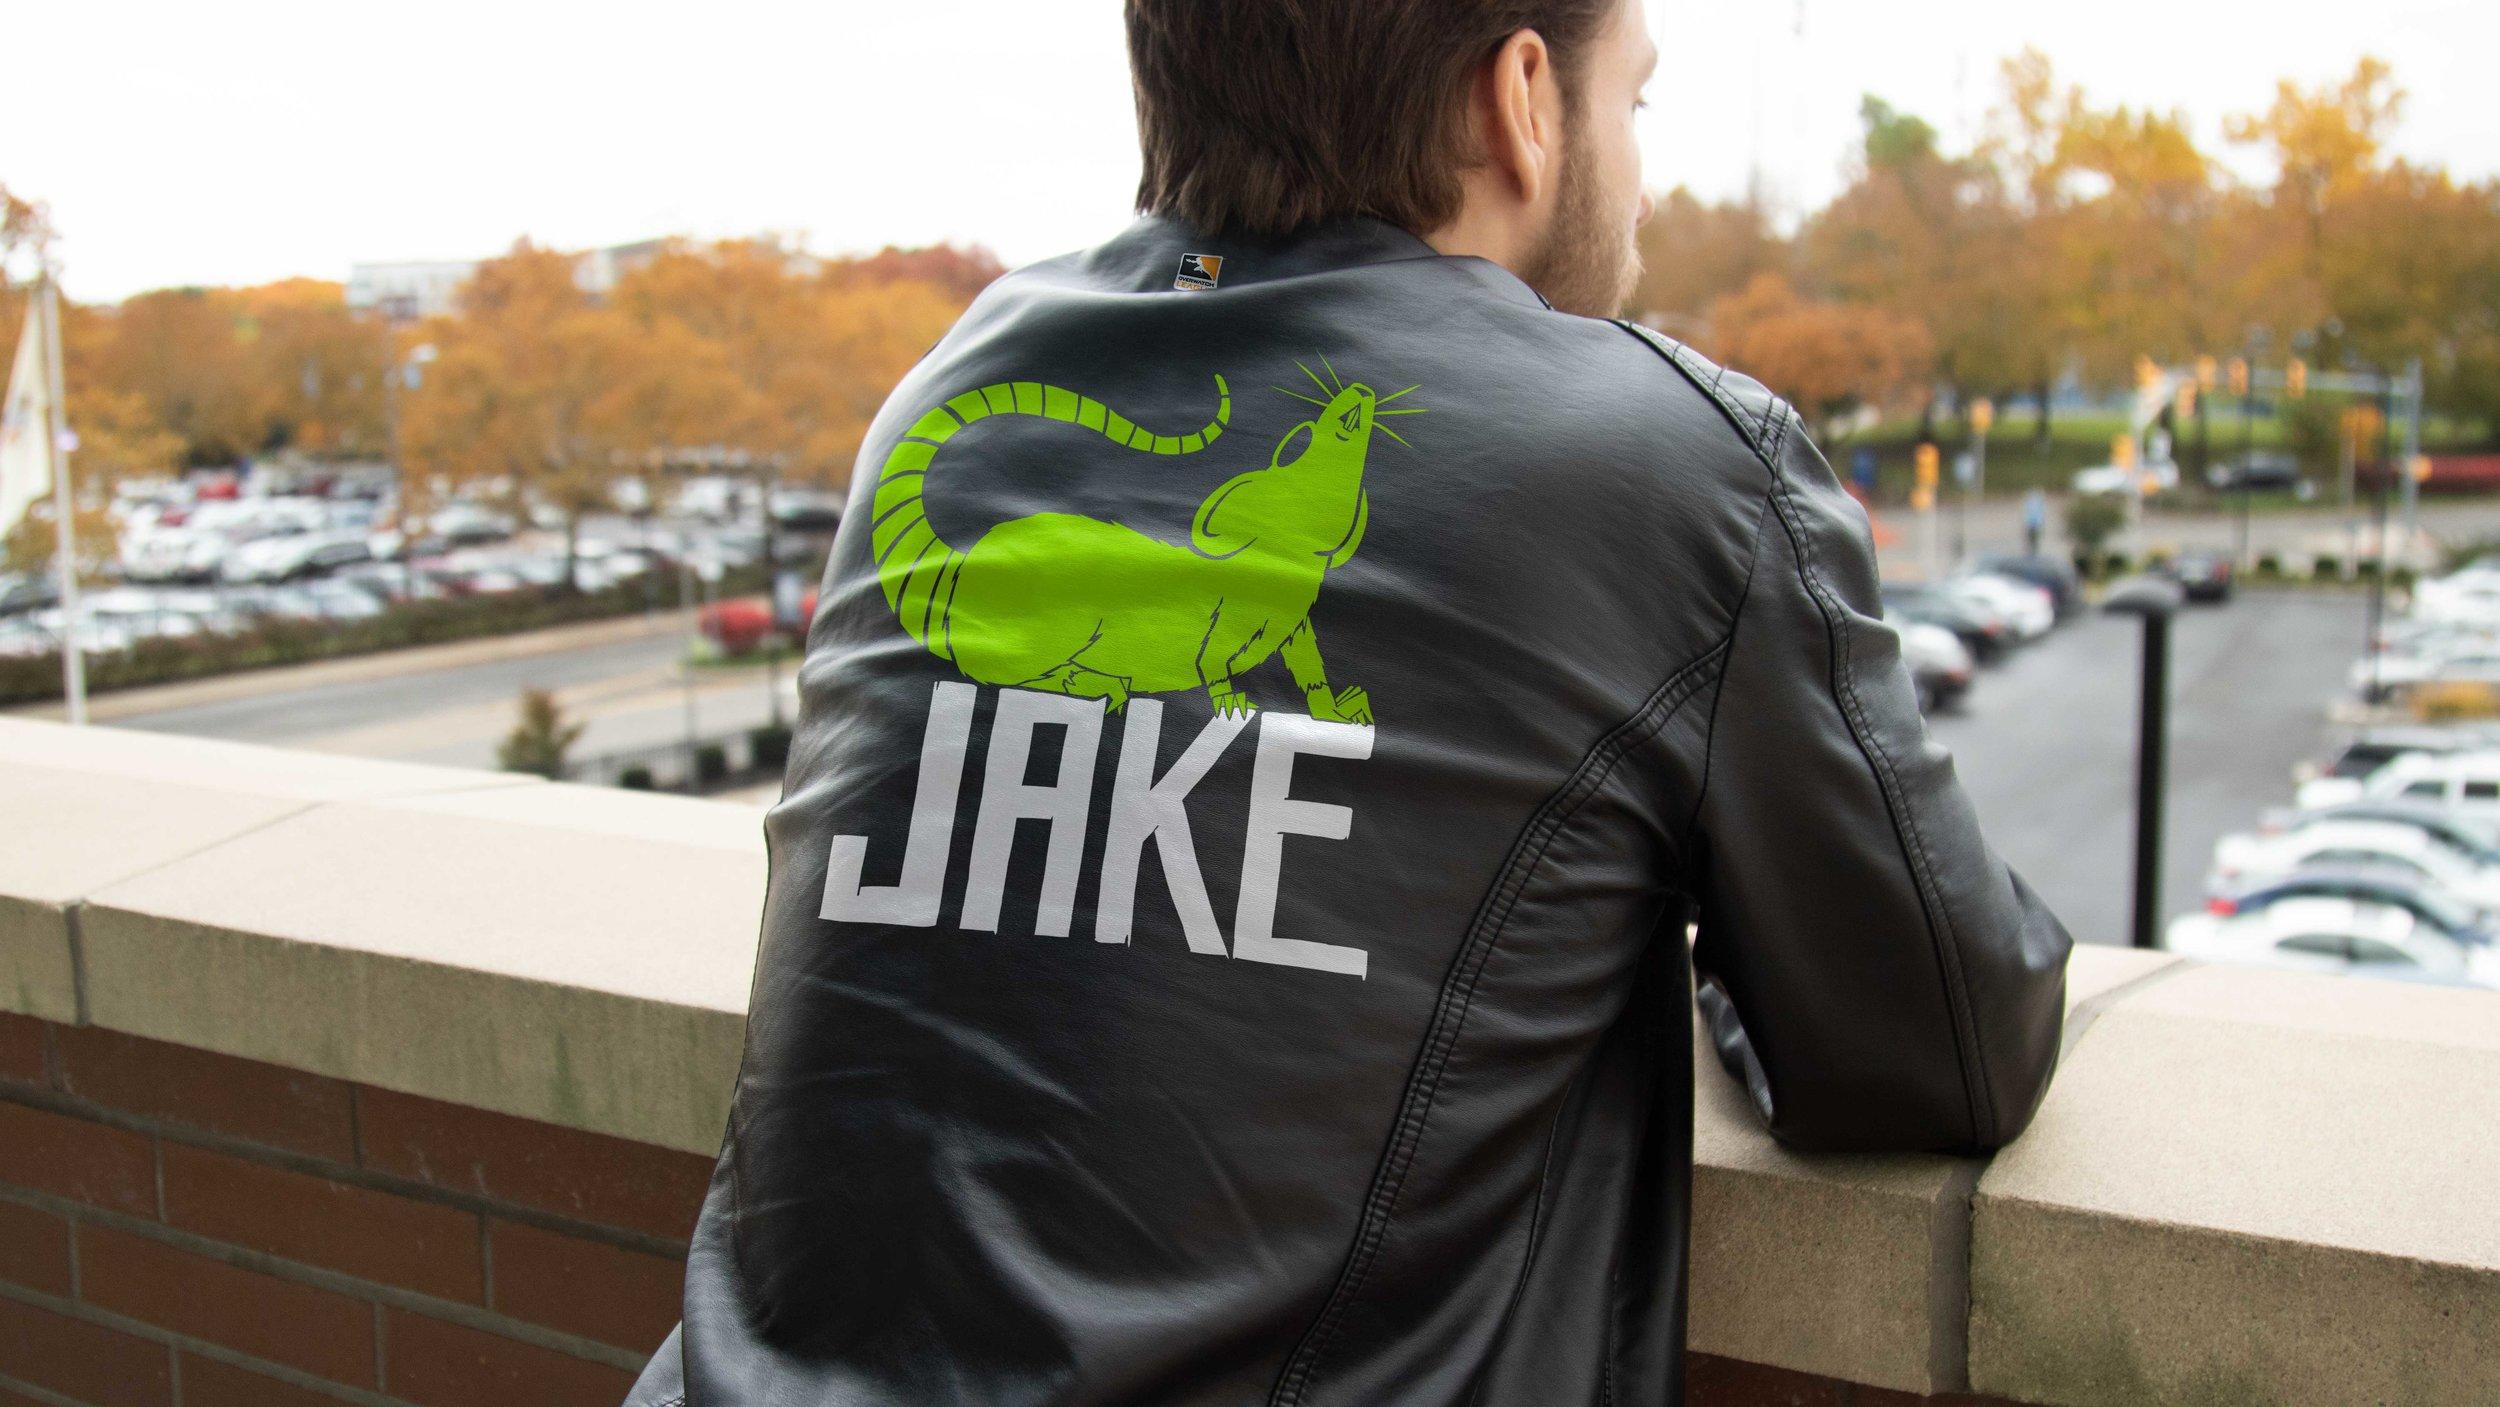 jake-jacket.jpg